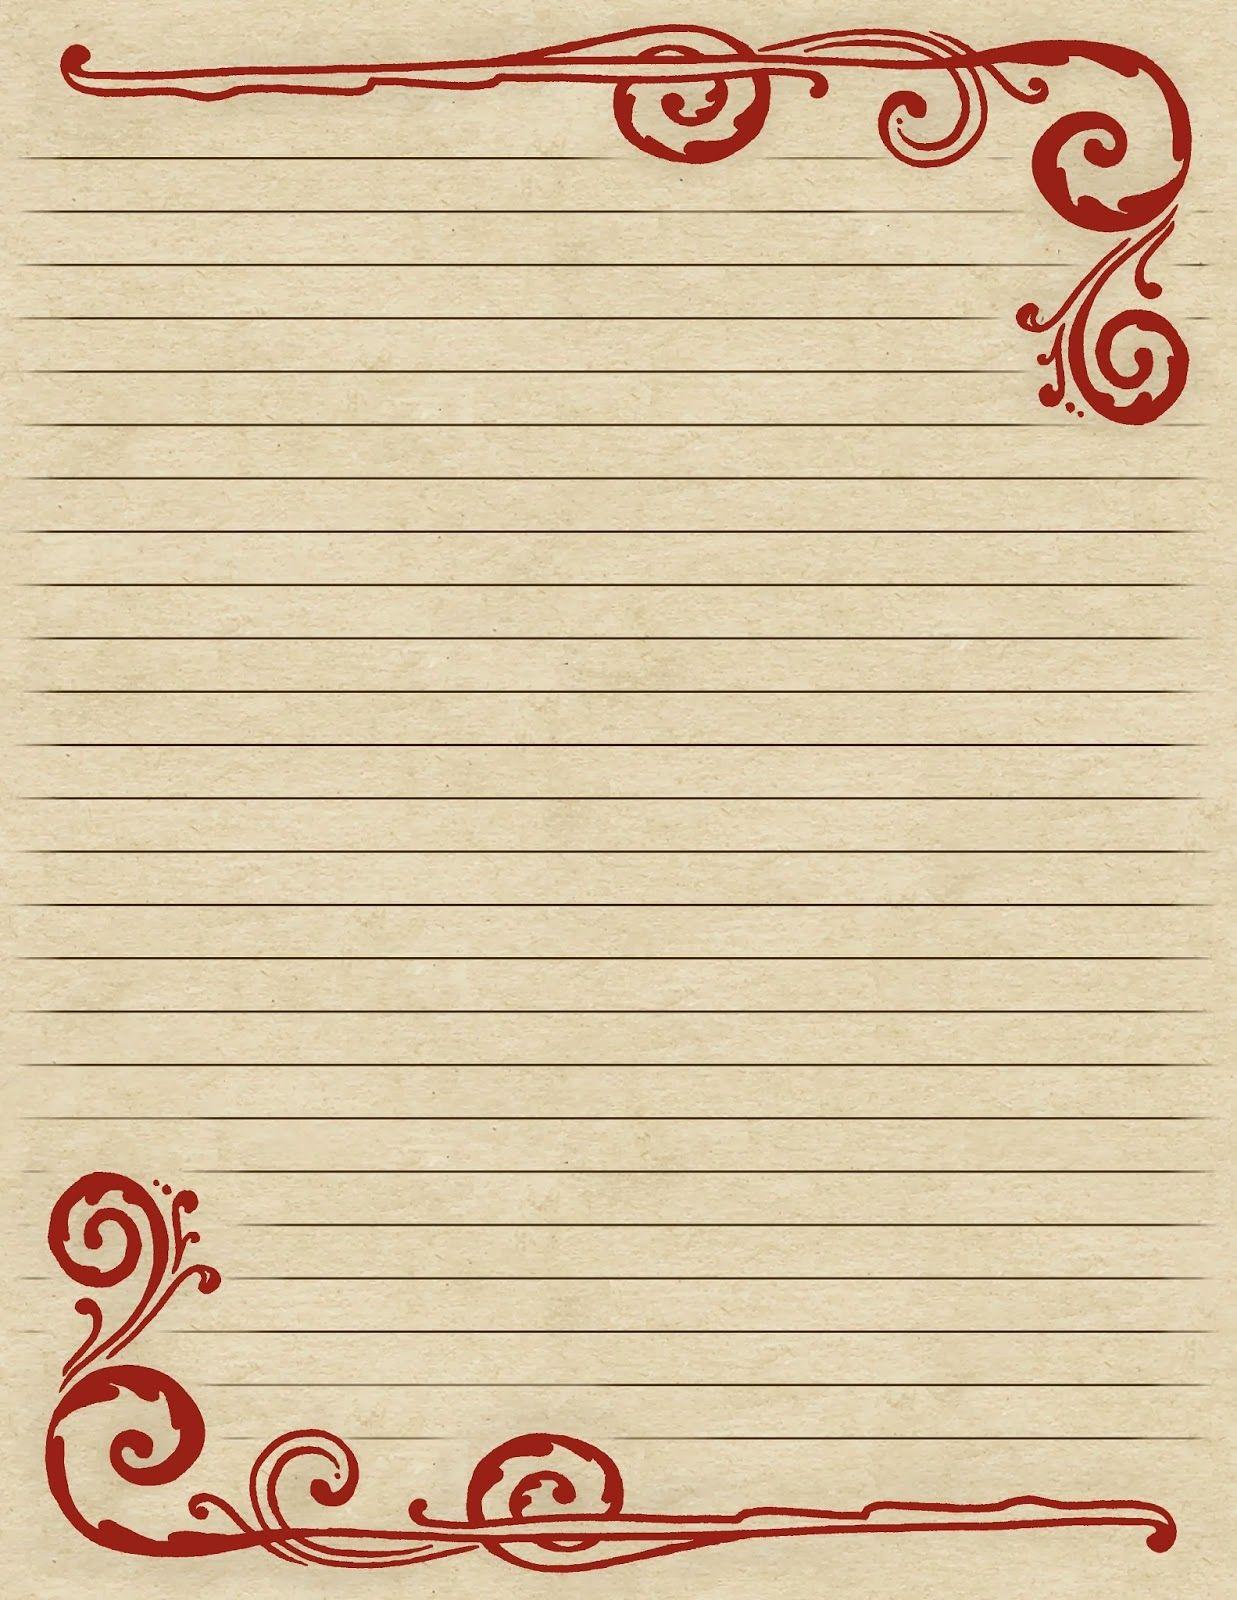 lilac & lavender: swirling border & lined paper   briefpapier